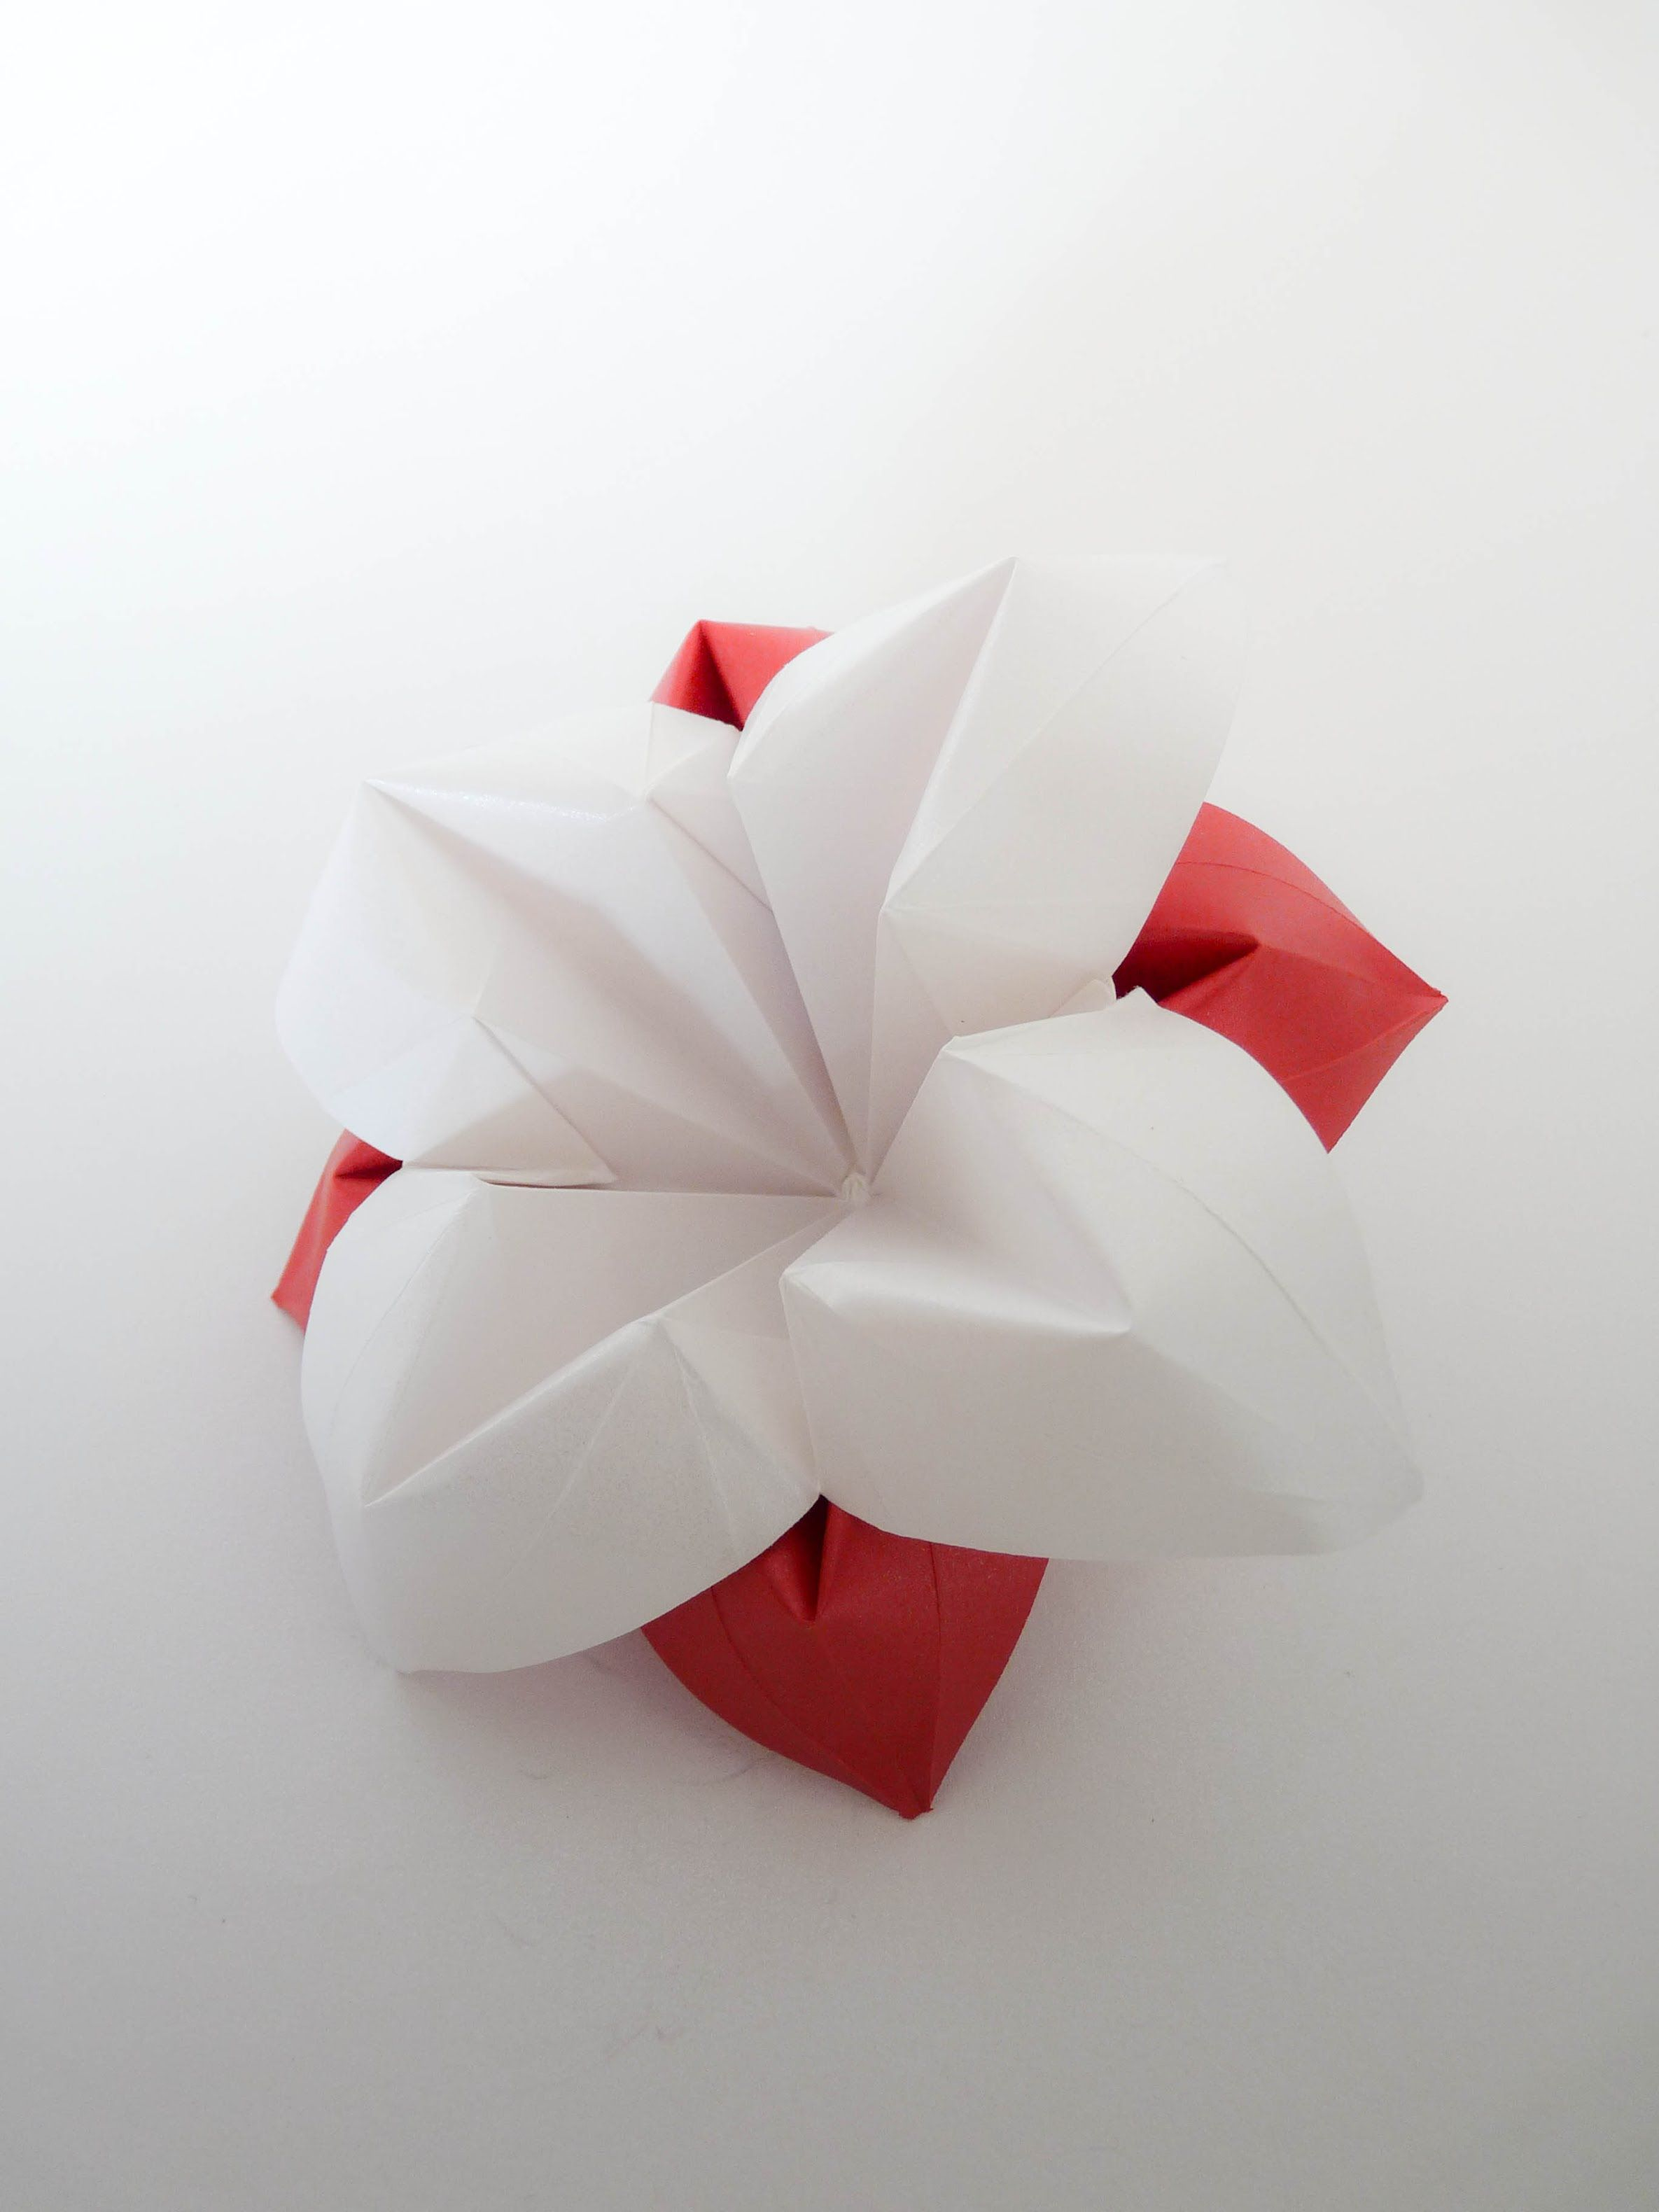 Origami Flower Vicente Dolz Gonna Make These All Pinterest Bird Curler Diagram Kusudama Me Craftsorigami